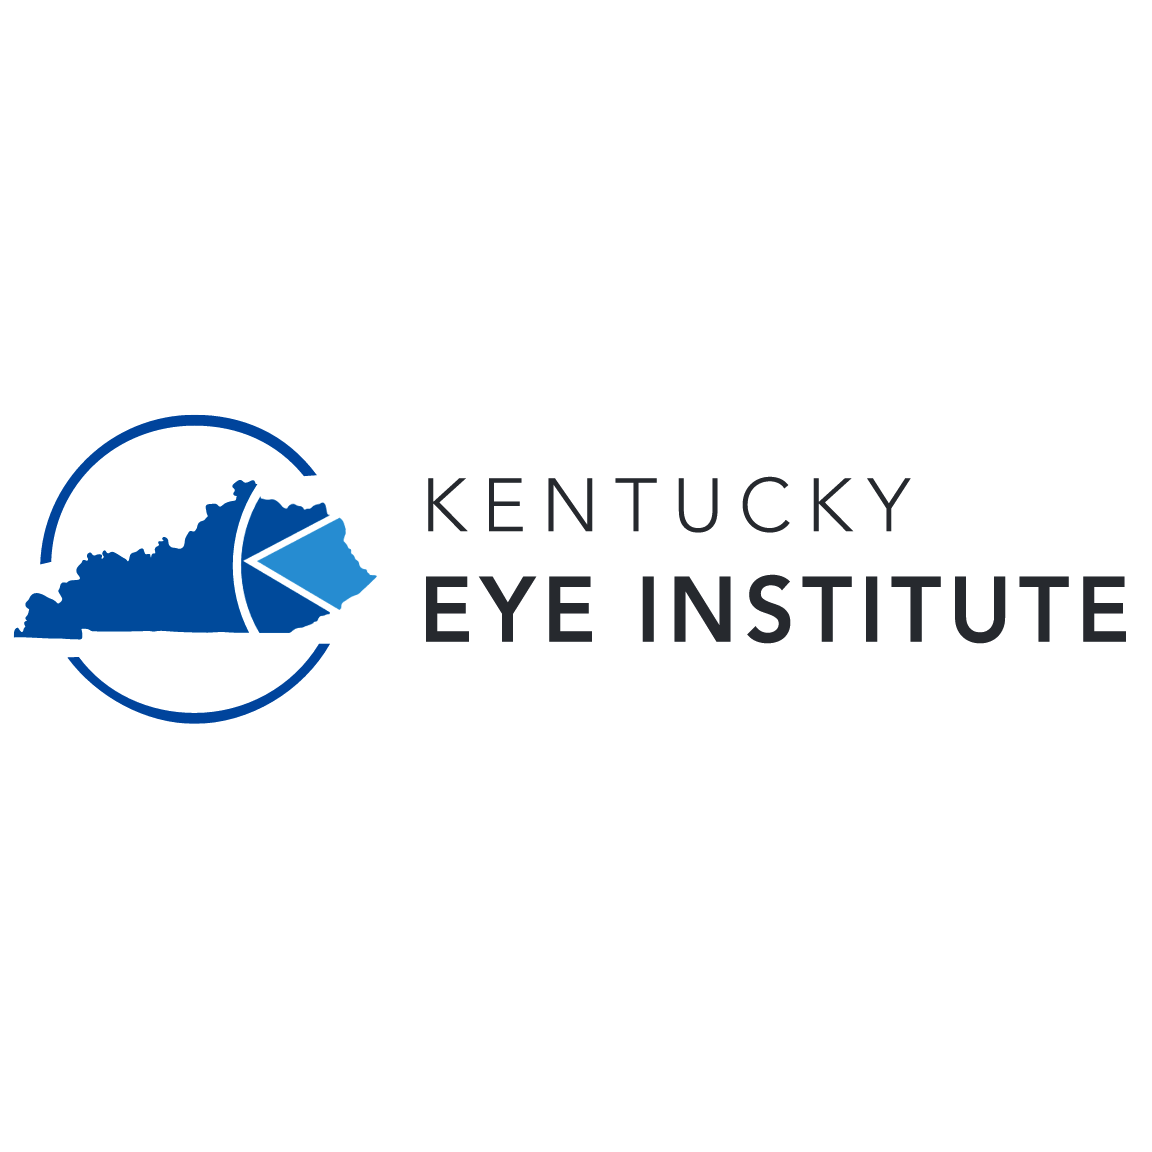 Kentucky Eye Institute image 8